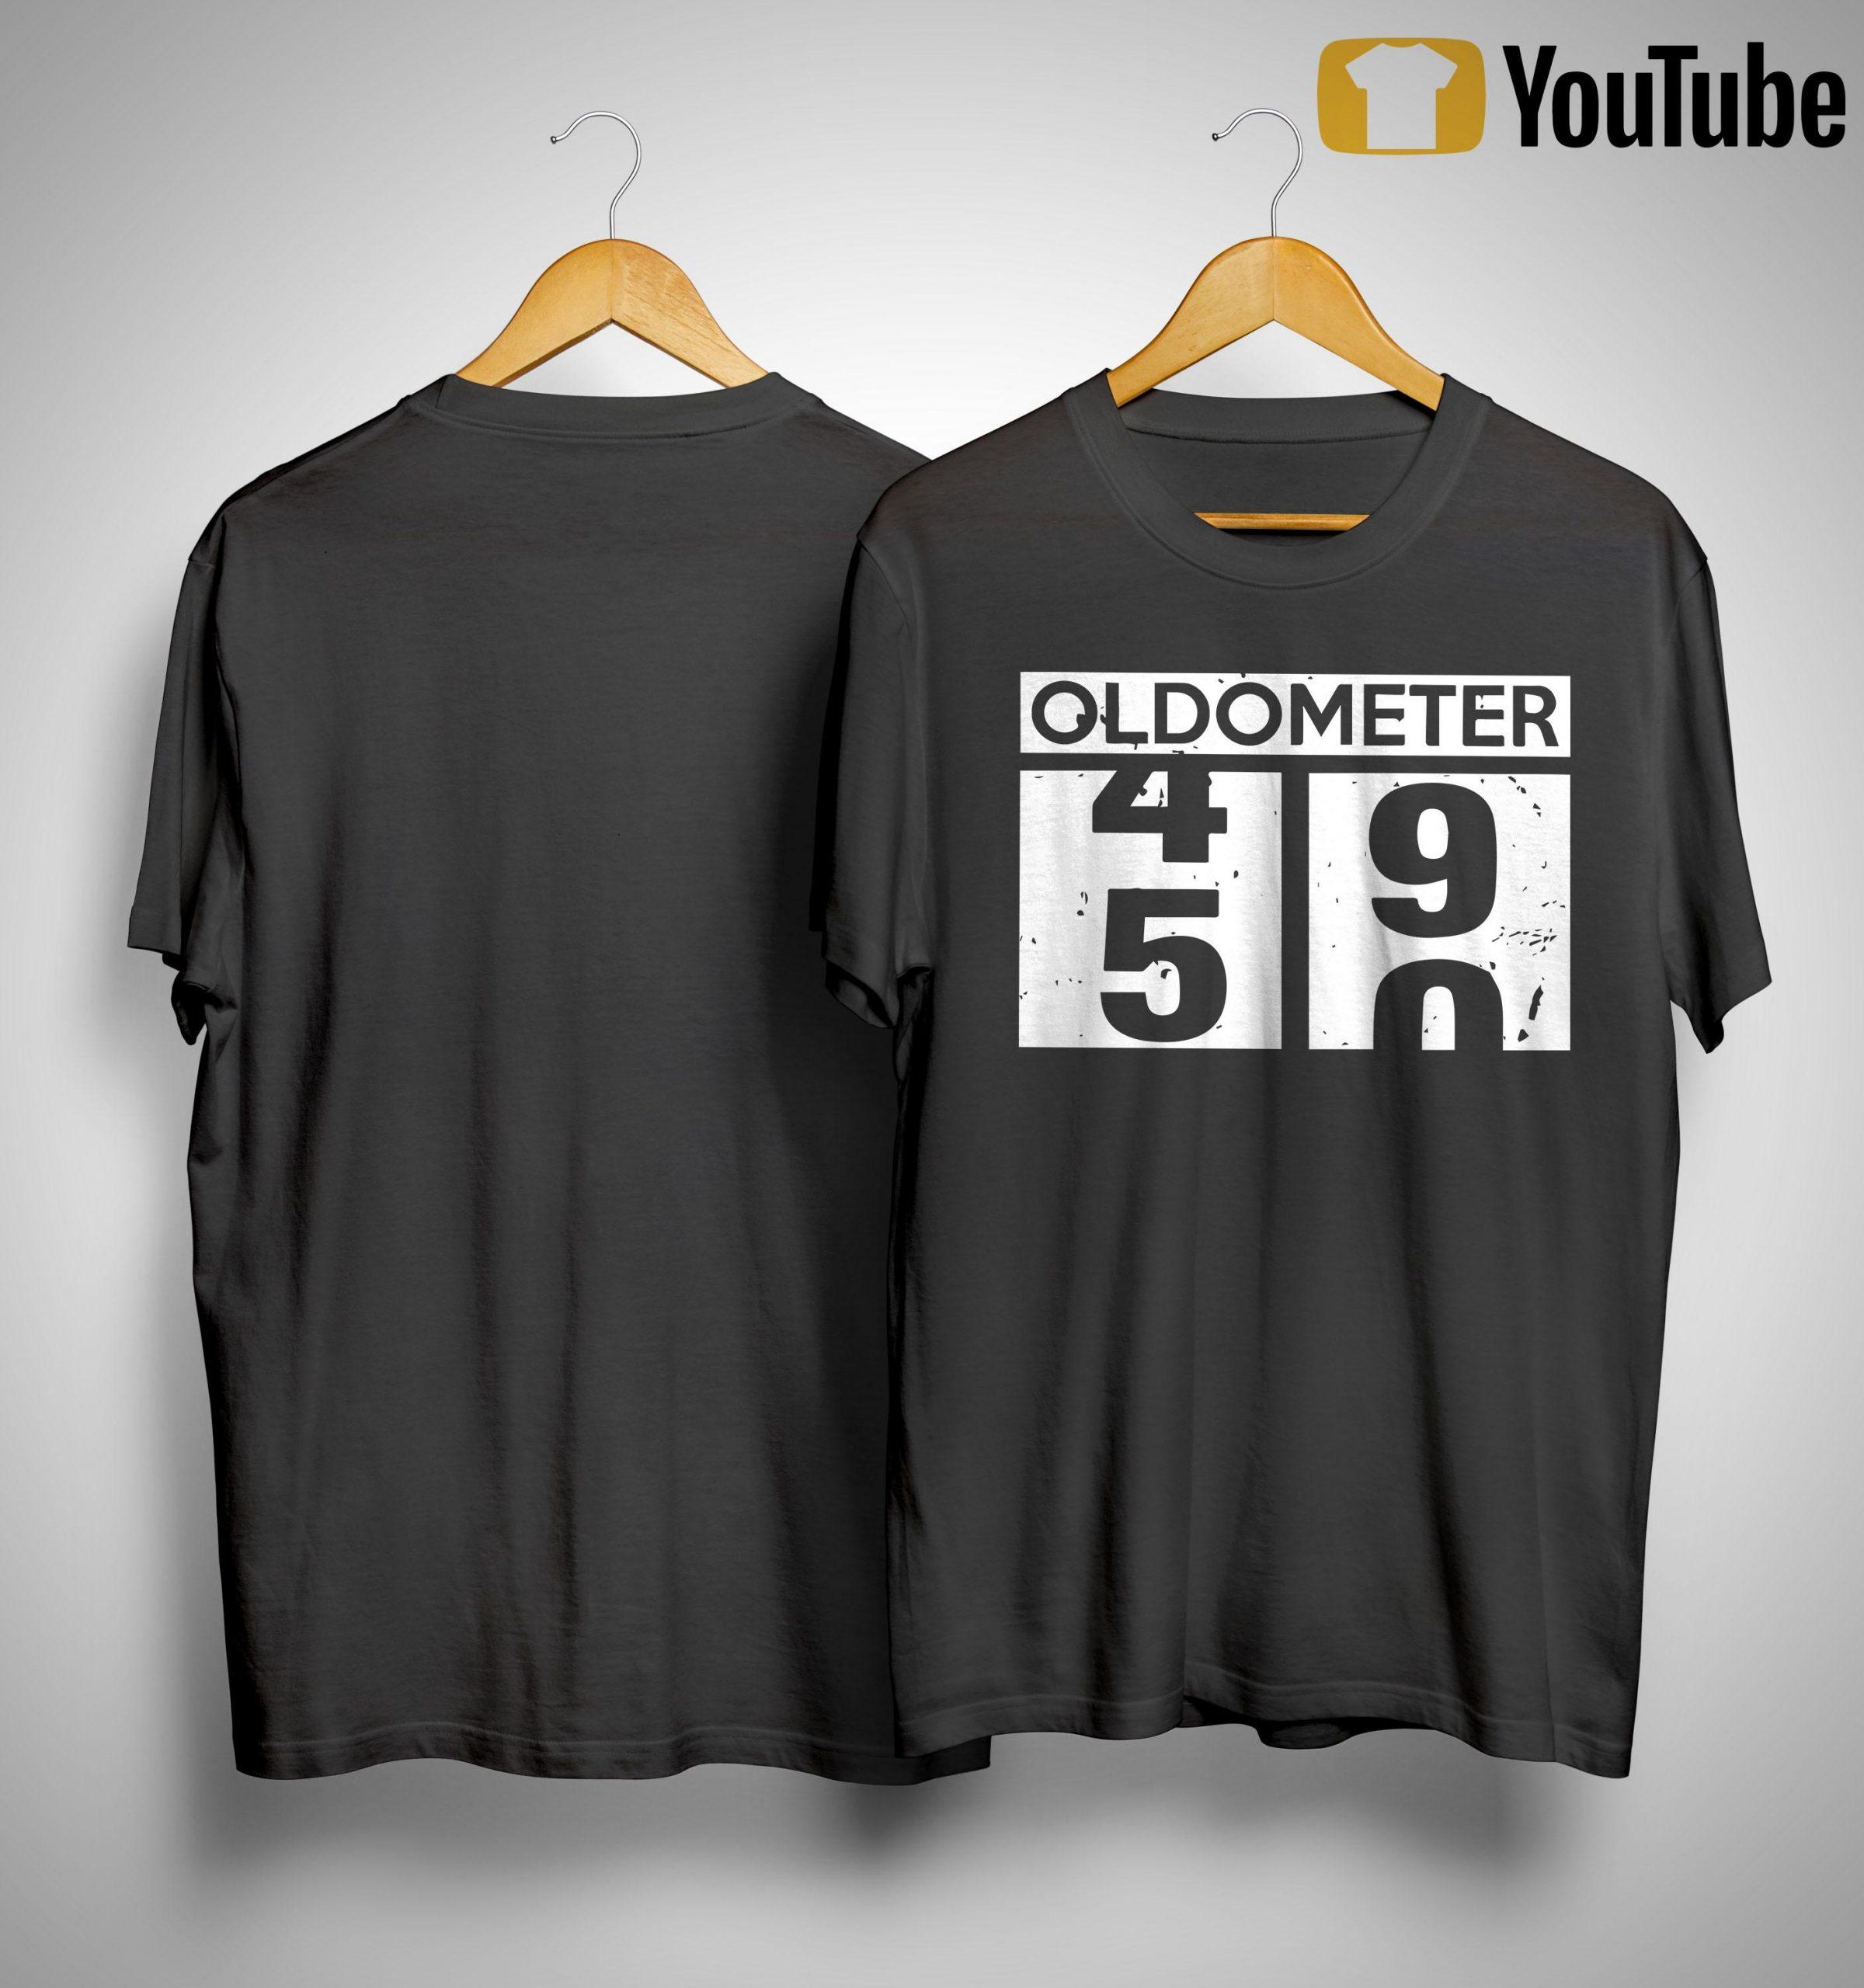 Oldometer 49 50 Shirt